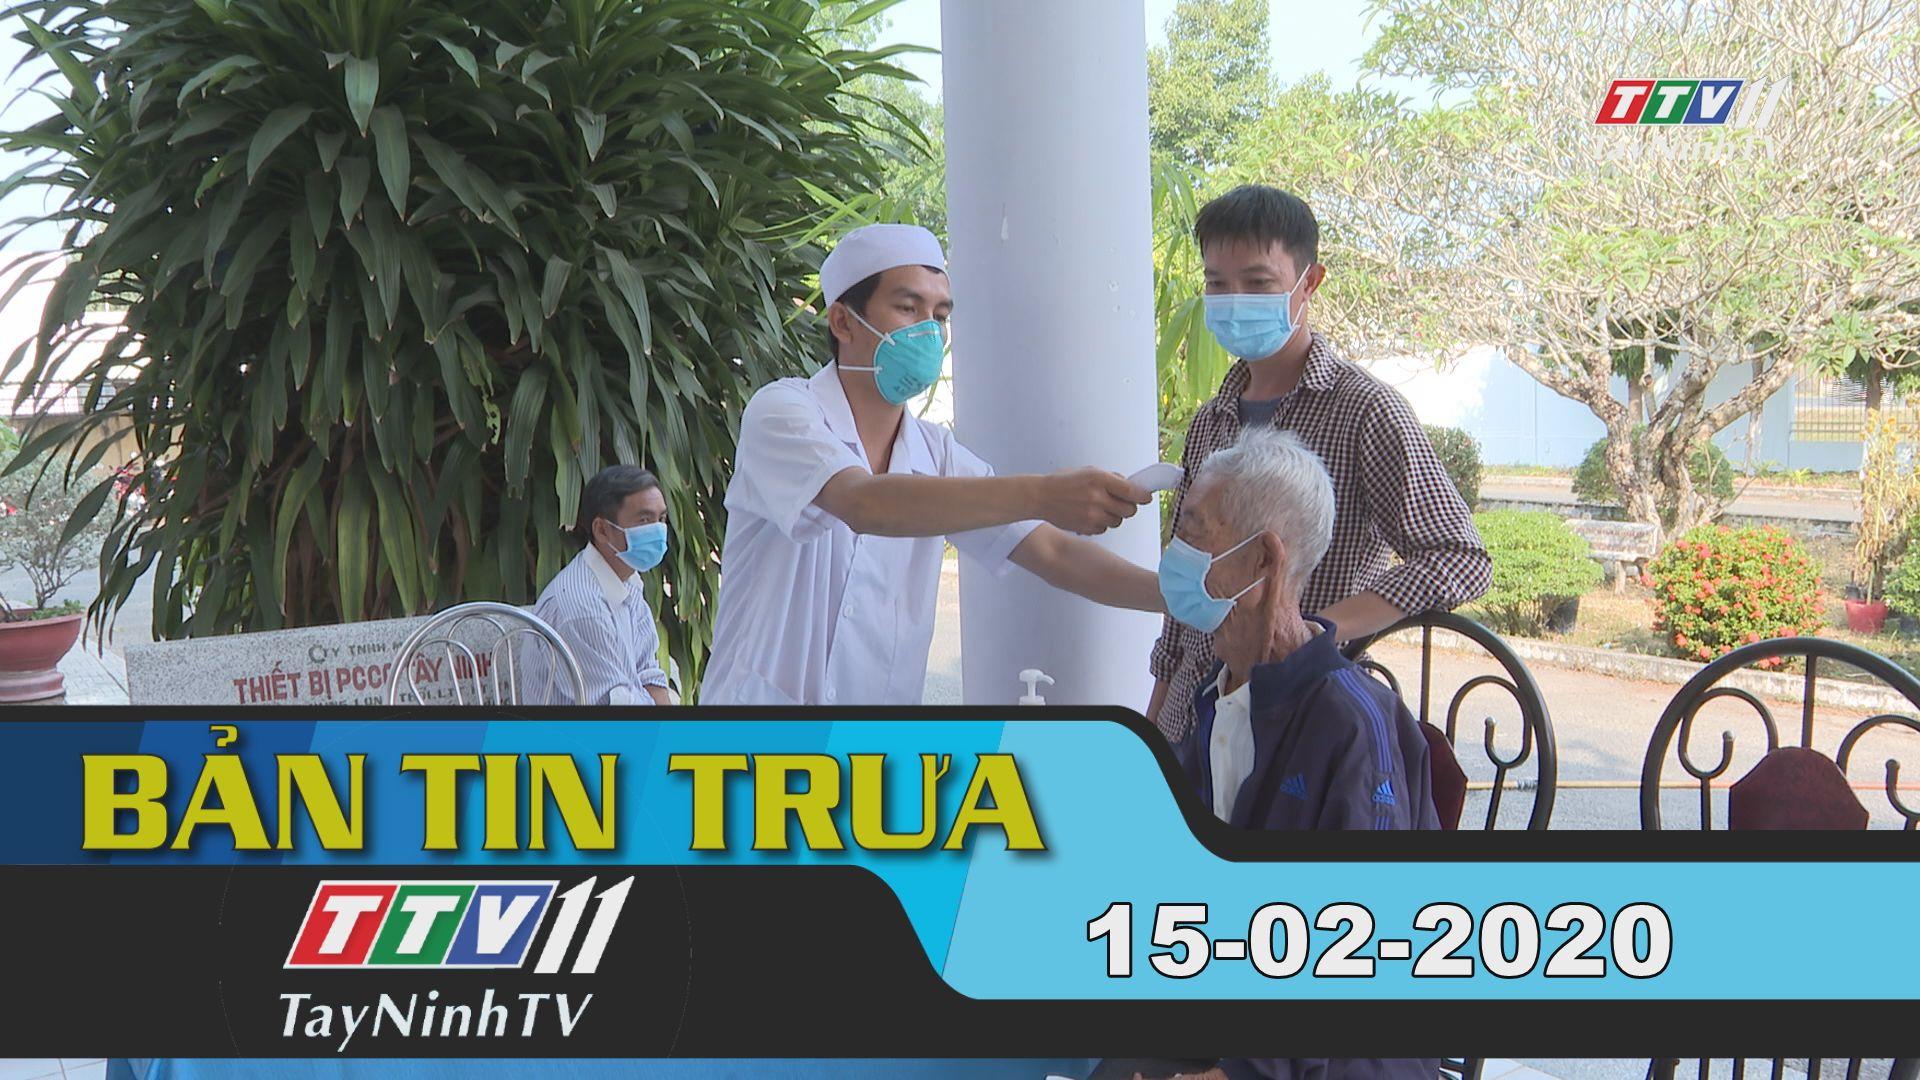 Bản tin trưa 15-02-2020 | Tin tức hôm nay | TayNinhTV